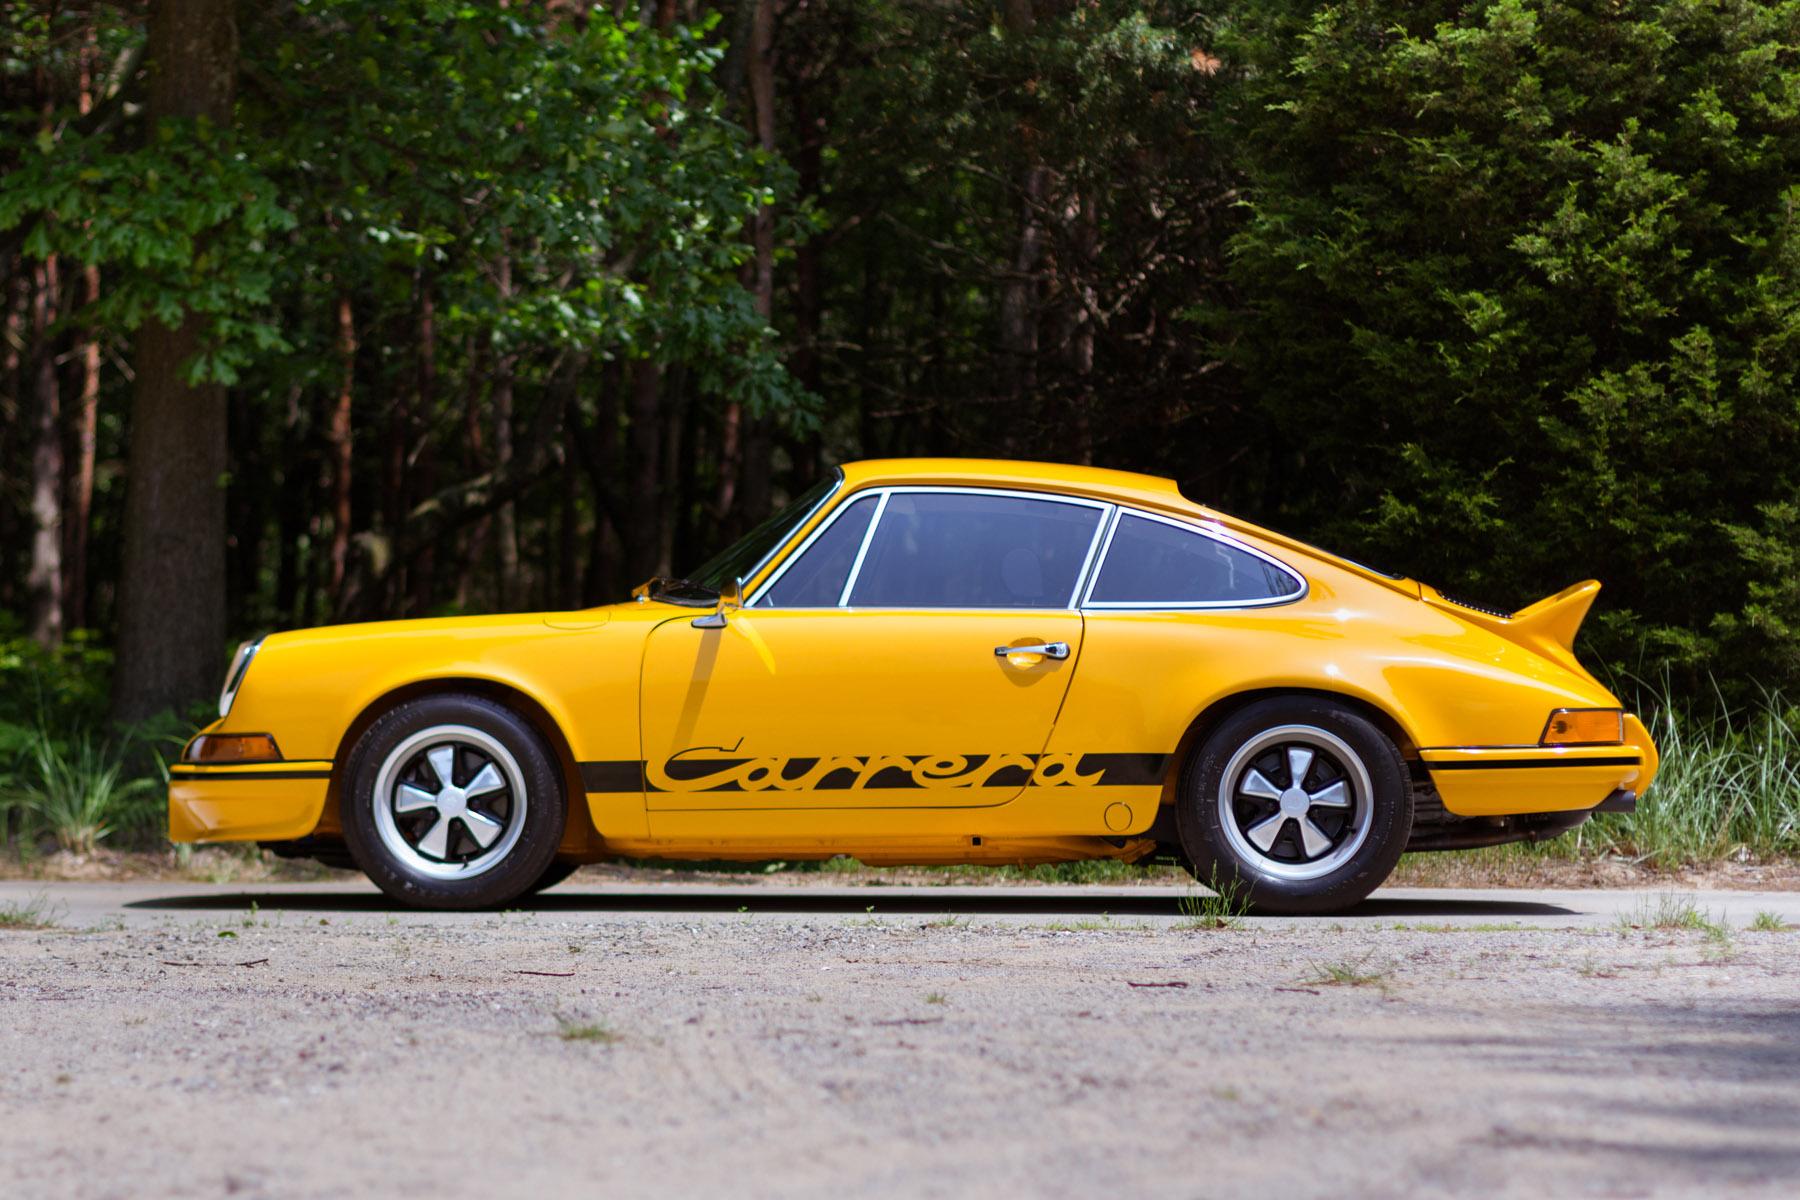 On the block: 1973 Porsche 911 2.7 Carrera RS (Estimate $475,000 - $550,000). Image courtesy Gooding & Company/Mike Maez